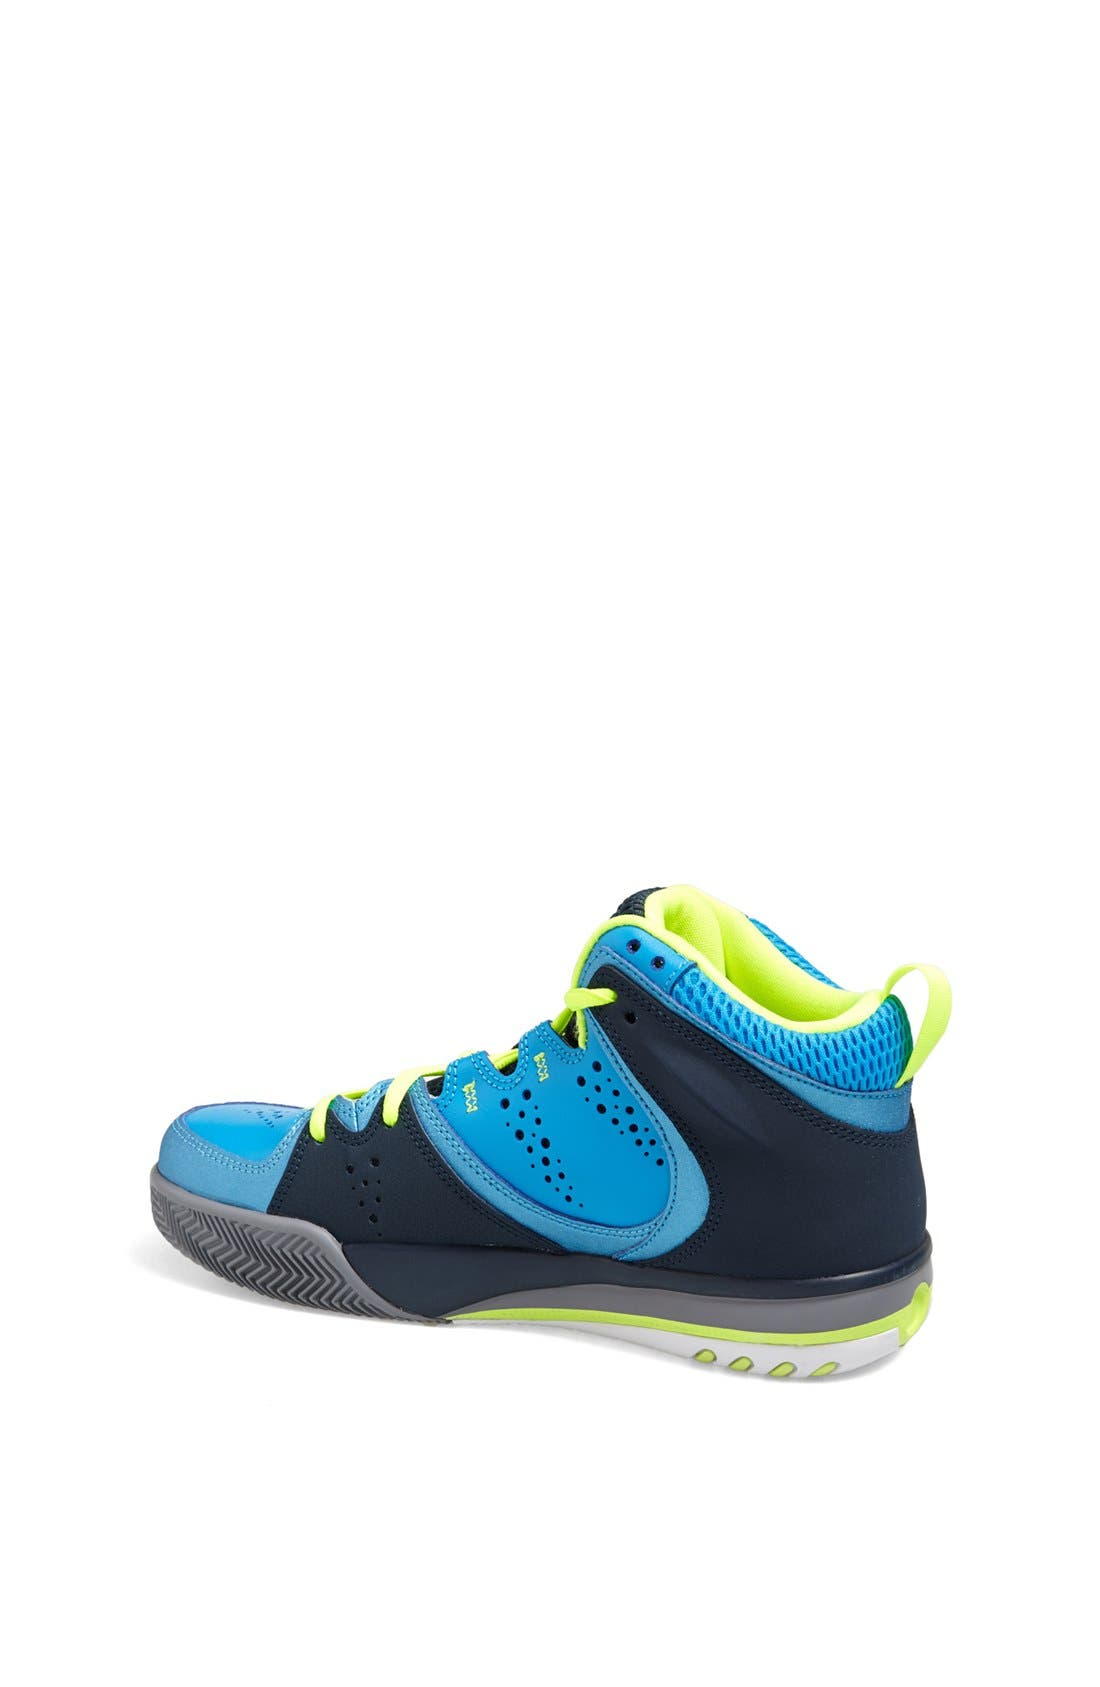 Alternate Image 2  - Nike 'Jordan Phase 23 2' Sneaker (Big Kid)